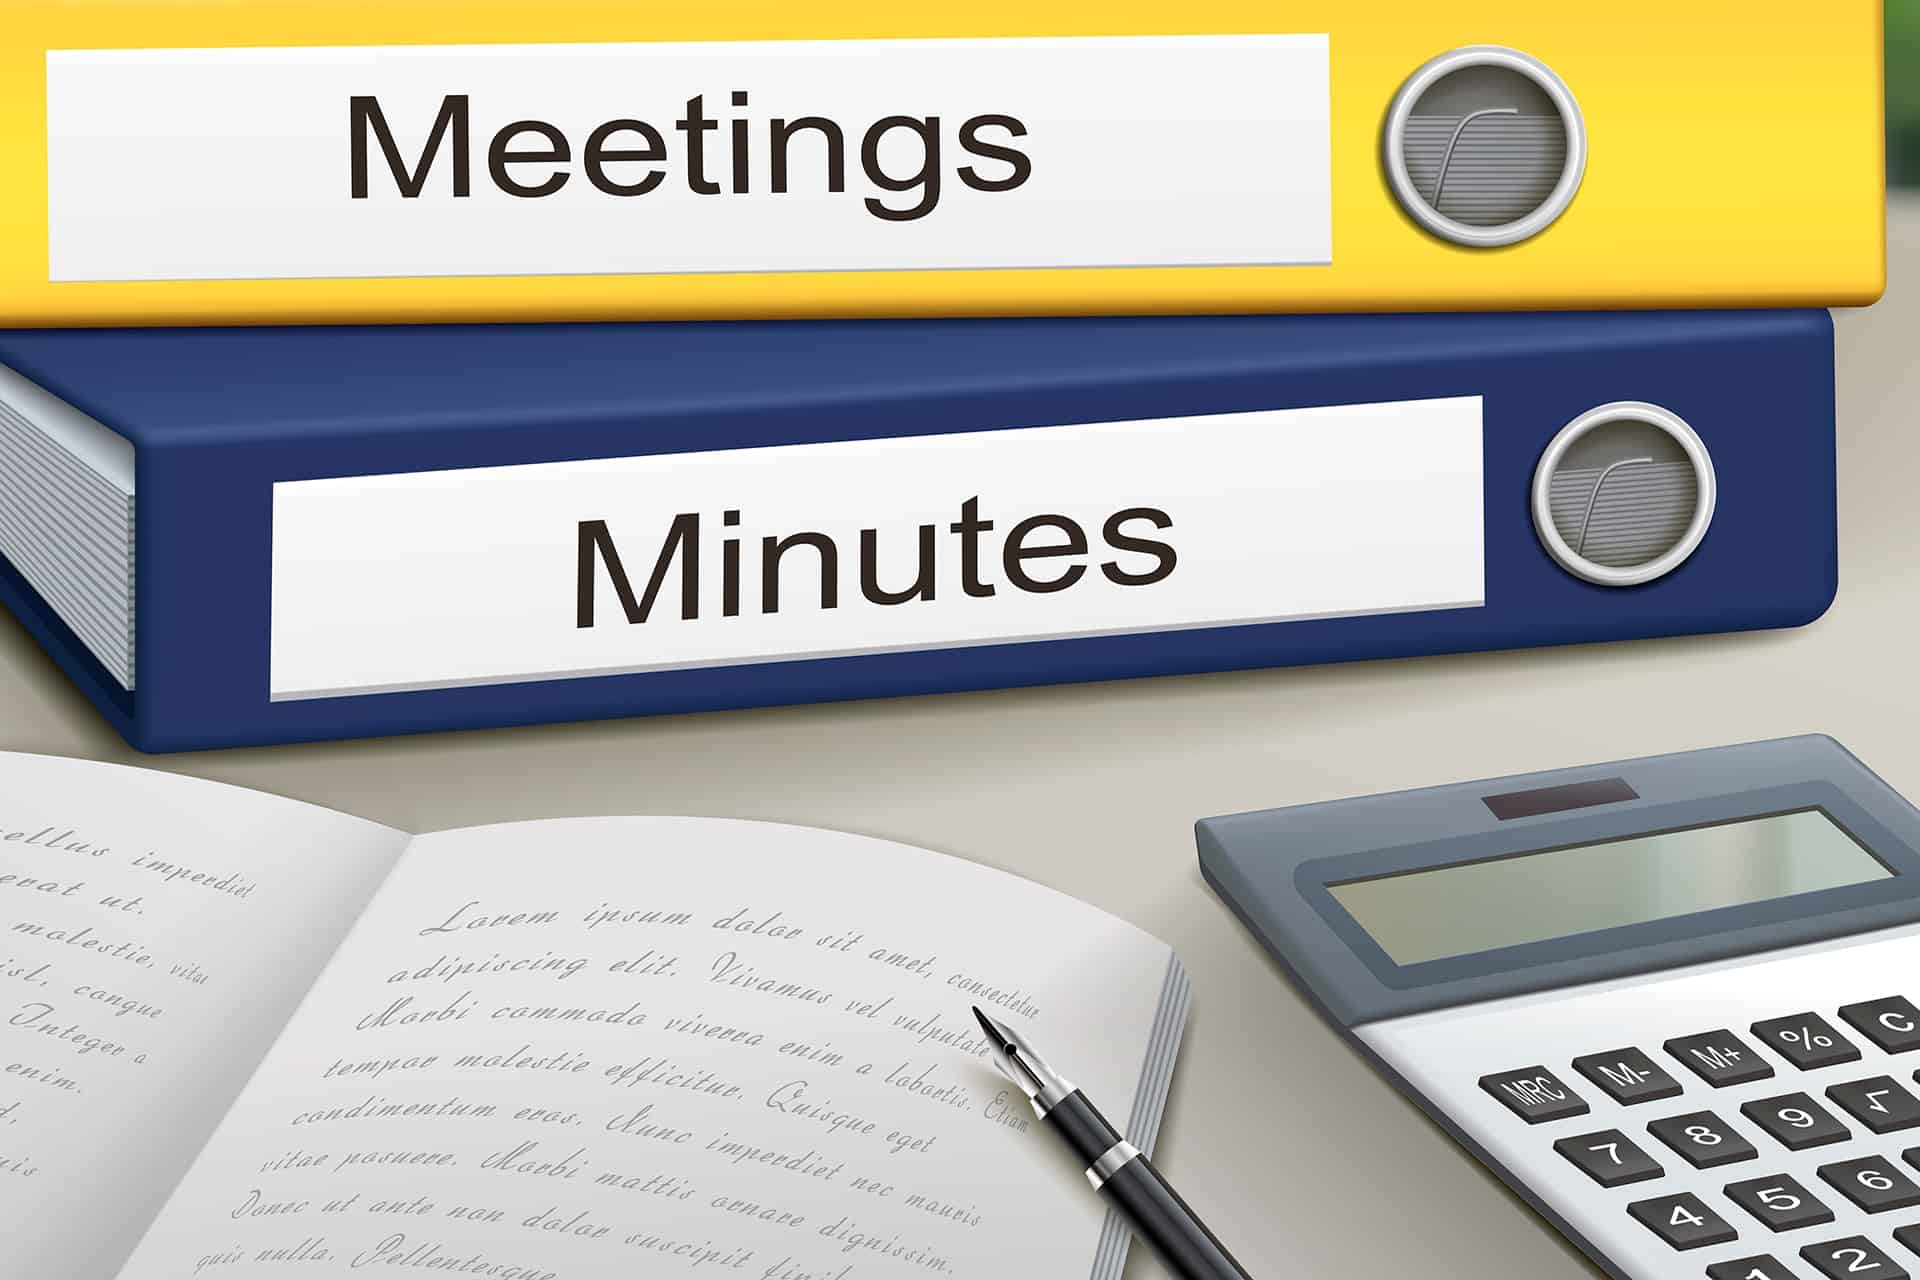 Meeting Agenda and Minutes | Downtown El Cajon